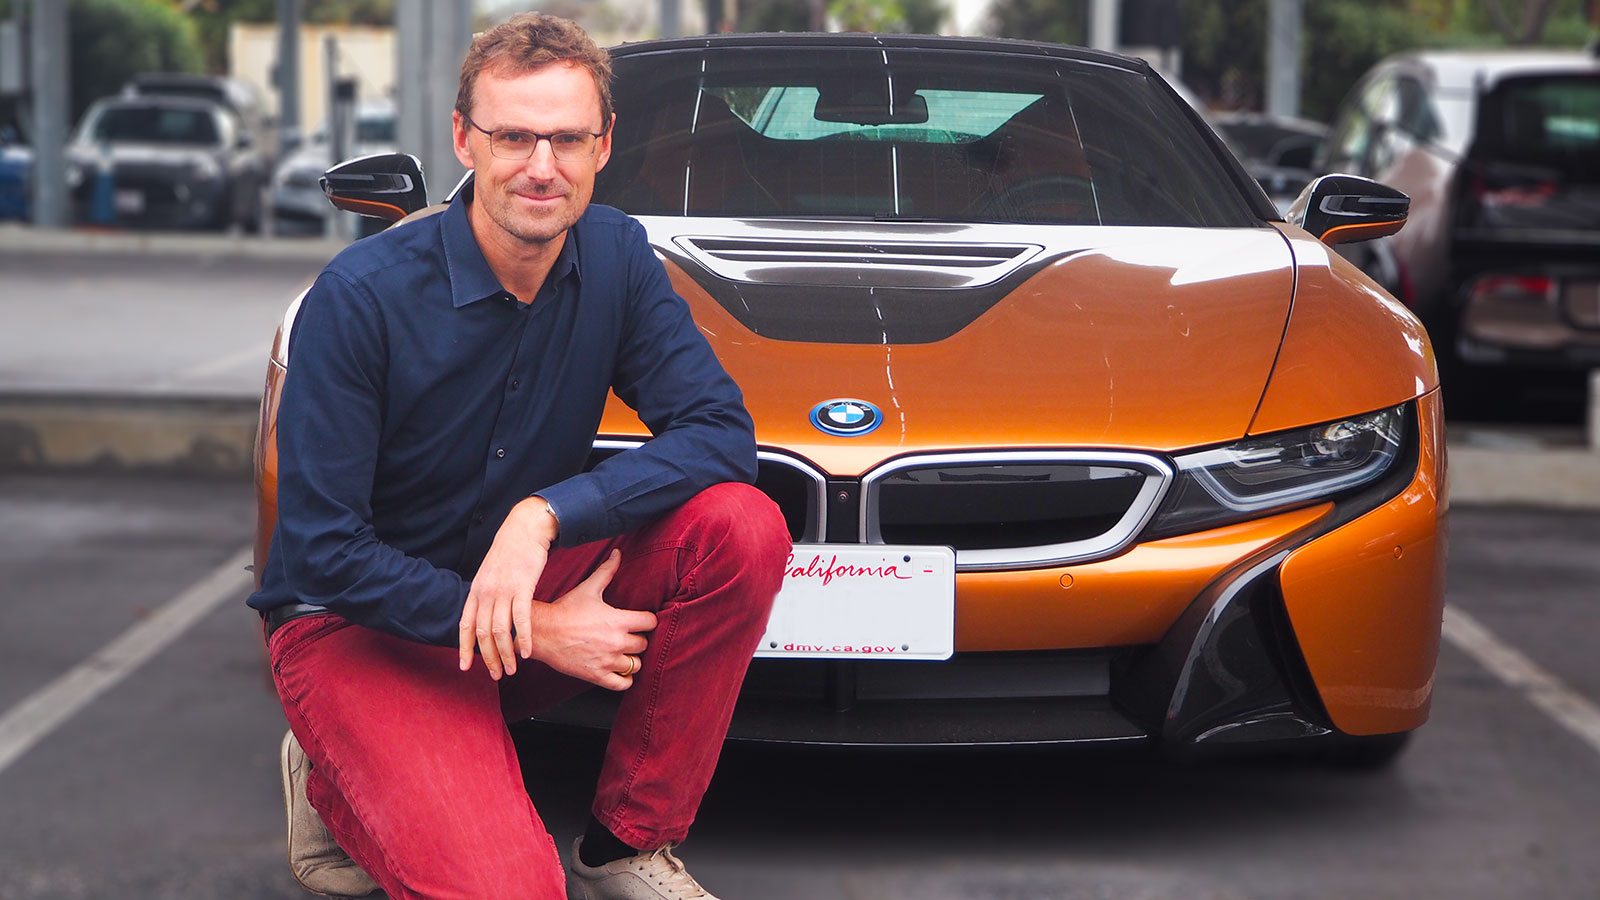 【BMW】世界的自動車メーカーが明かす、シリコンバレー投資戦略